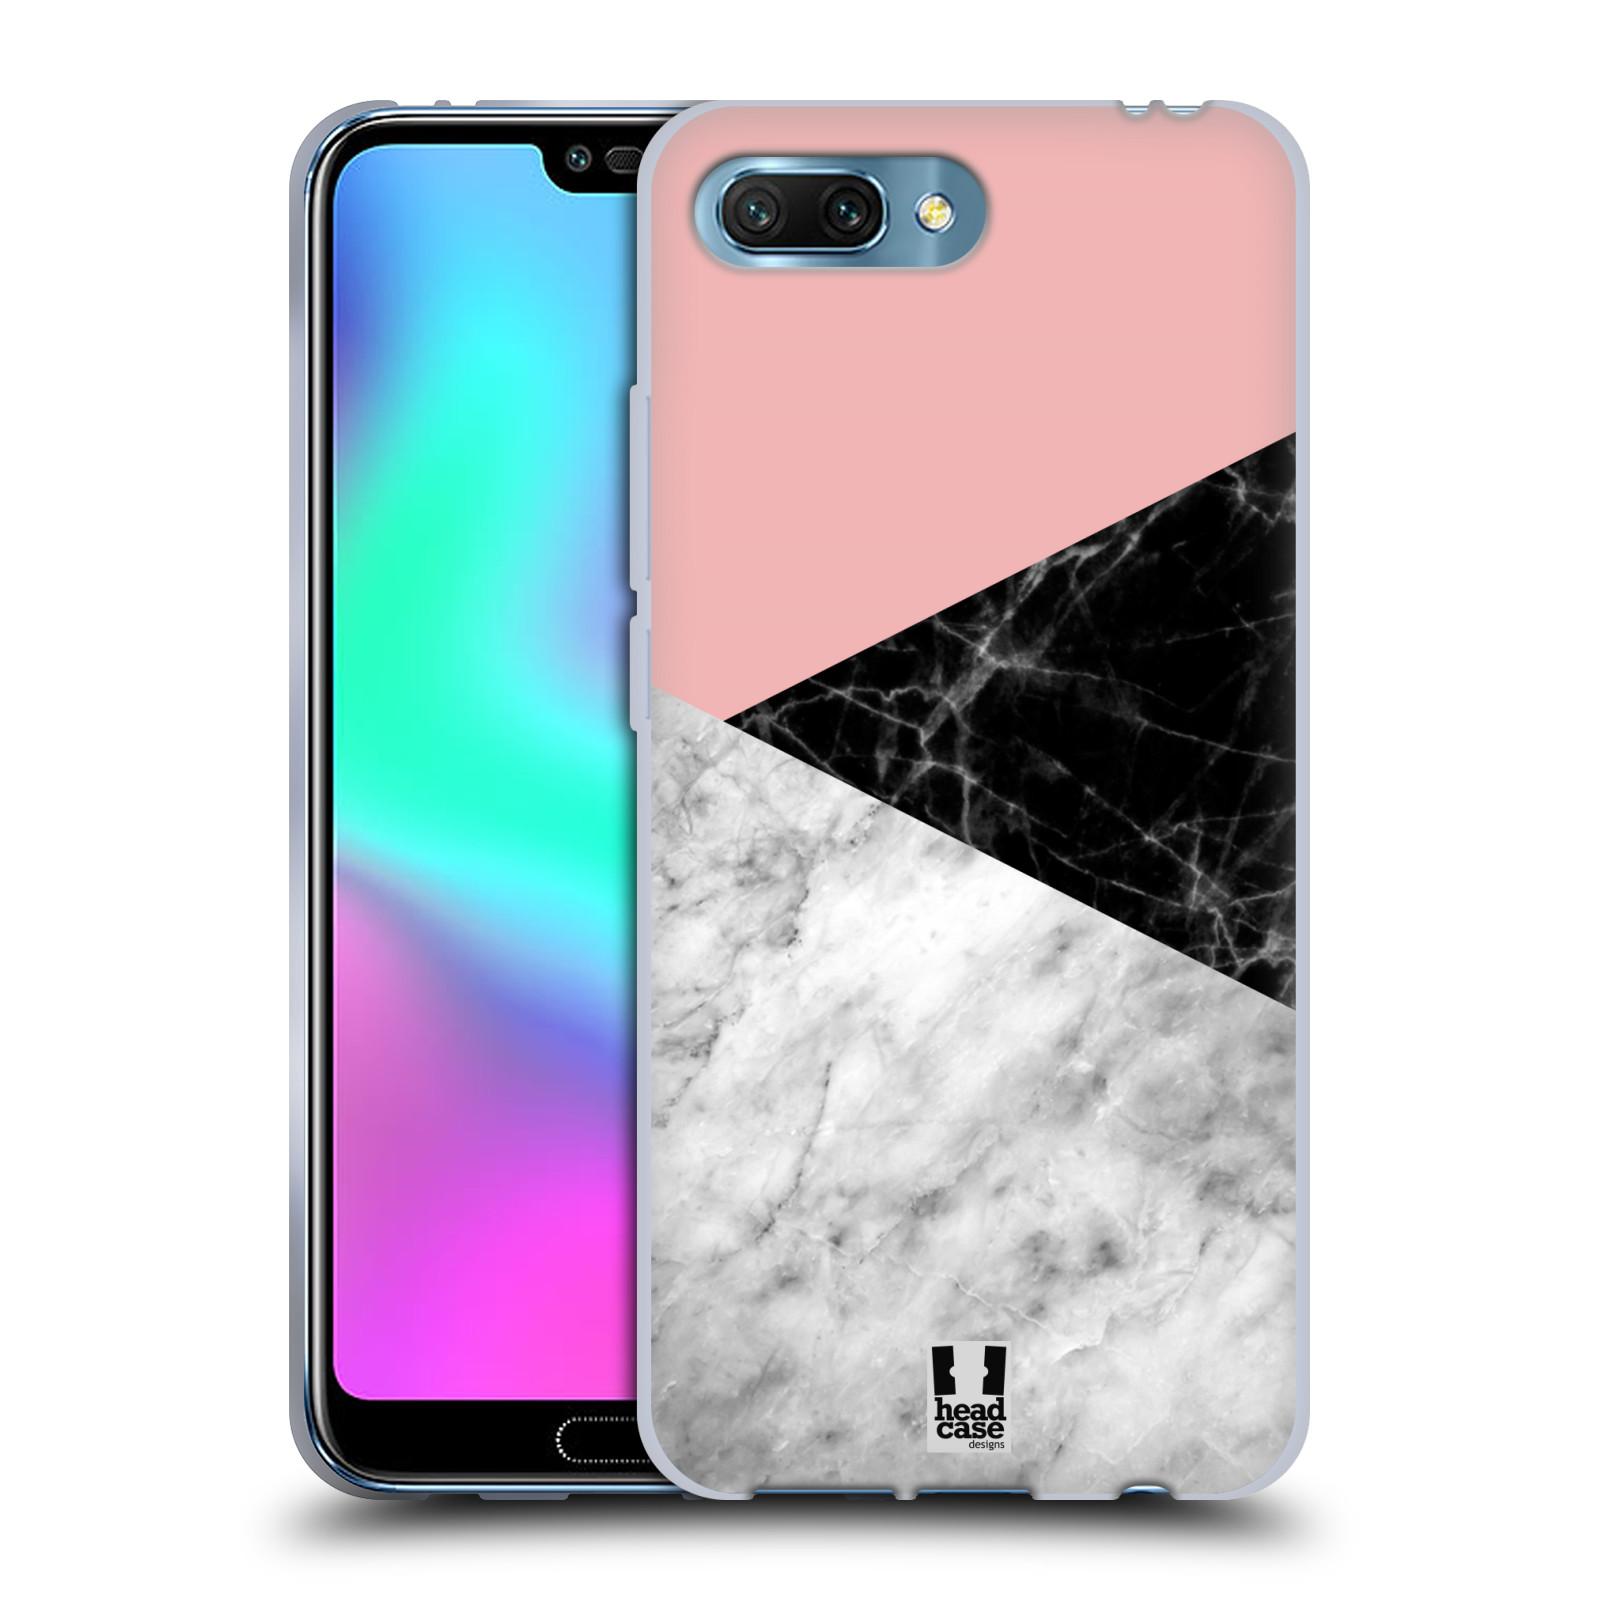 Silikonové pouzdro na mobil Honor 10 - Head Case - Mramor mix